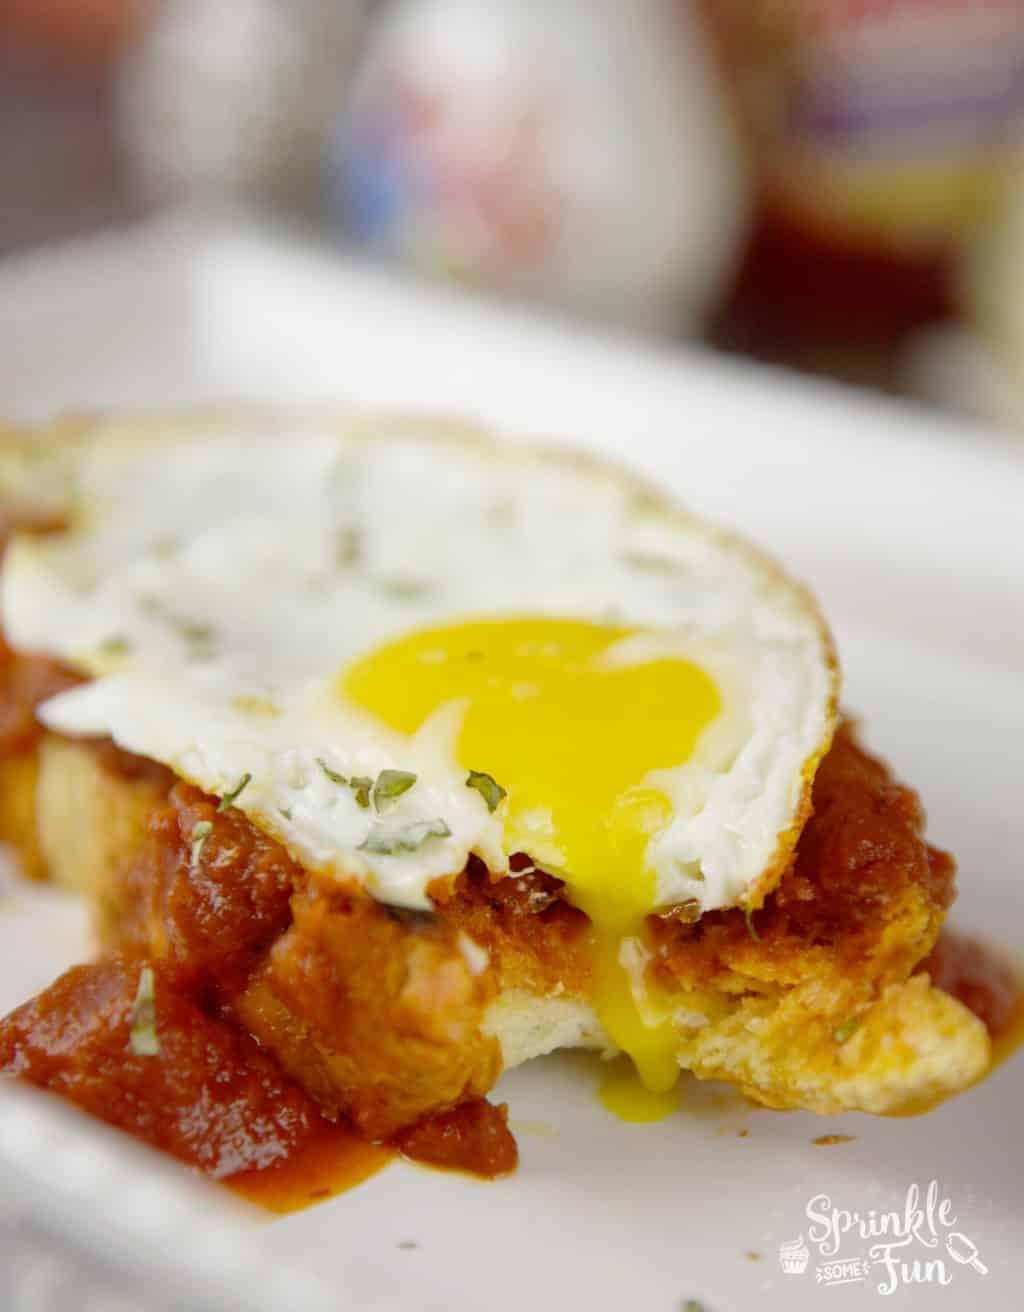 Italian Breakfast Toast! Change breakfast up with an Italian twist on toast and eggs!